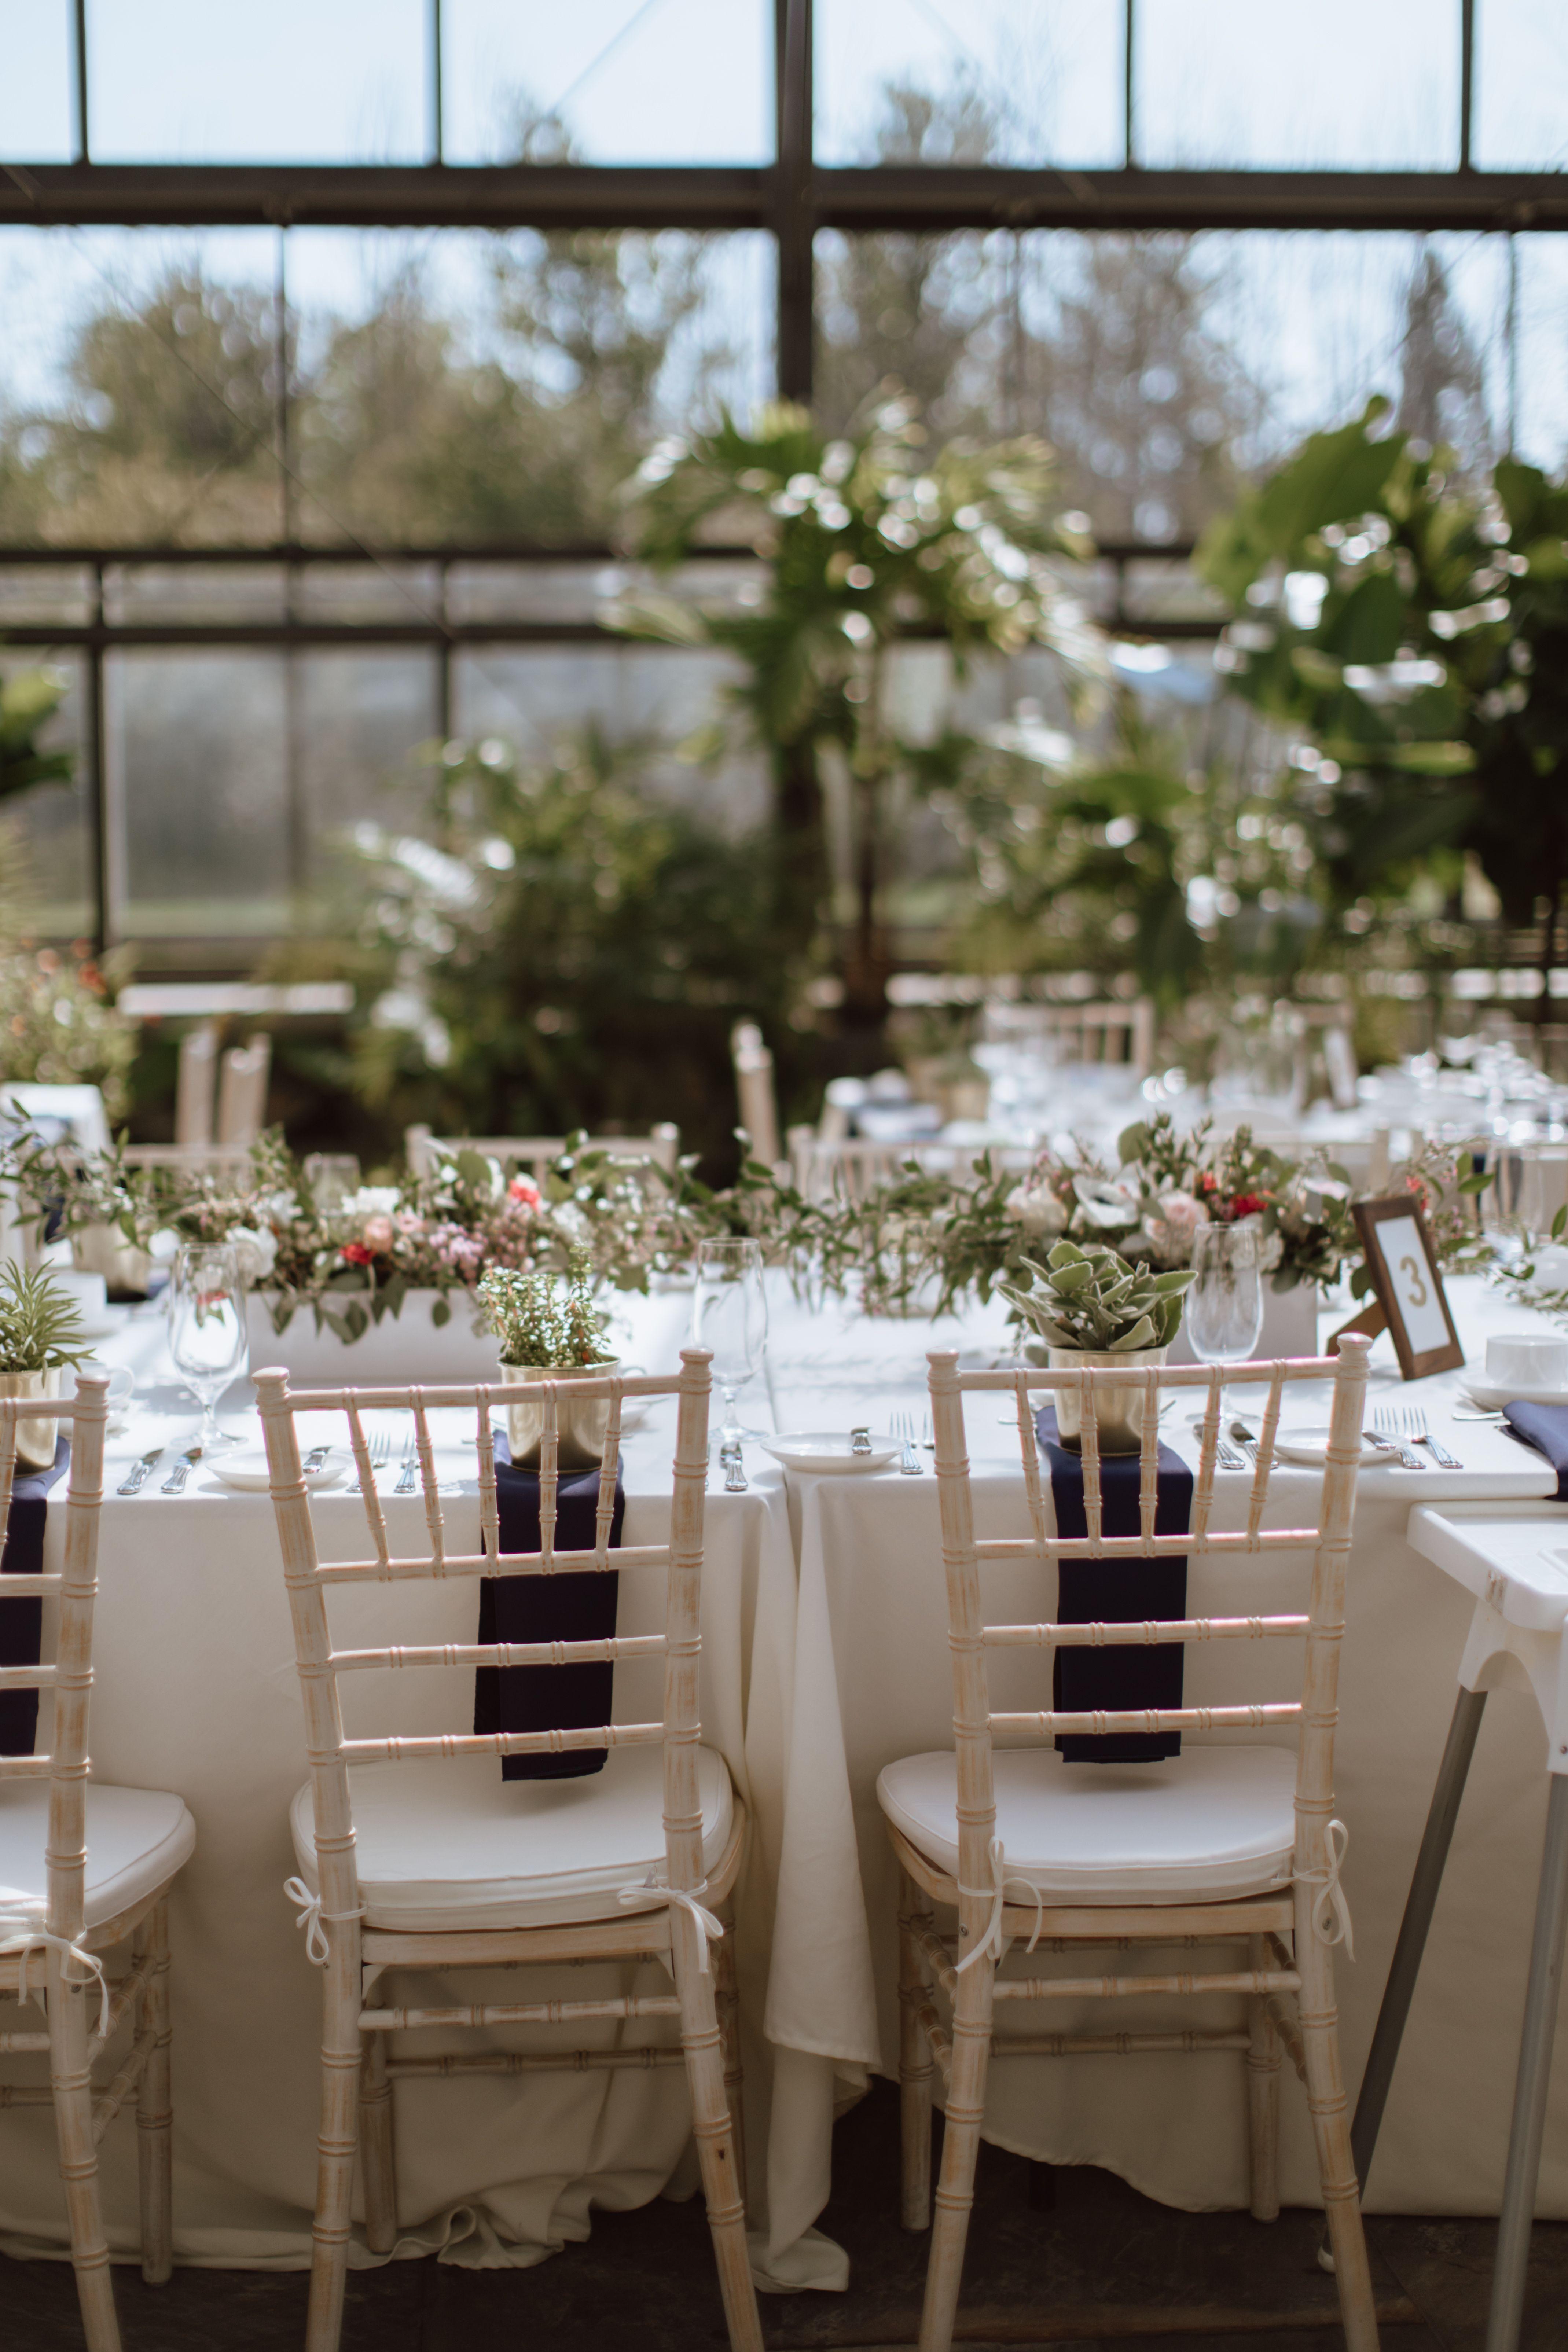 Aquatopia Conservatory Unique Wedding Venue Greenhouse